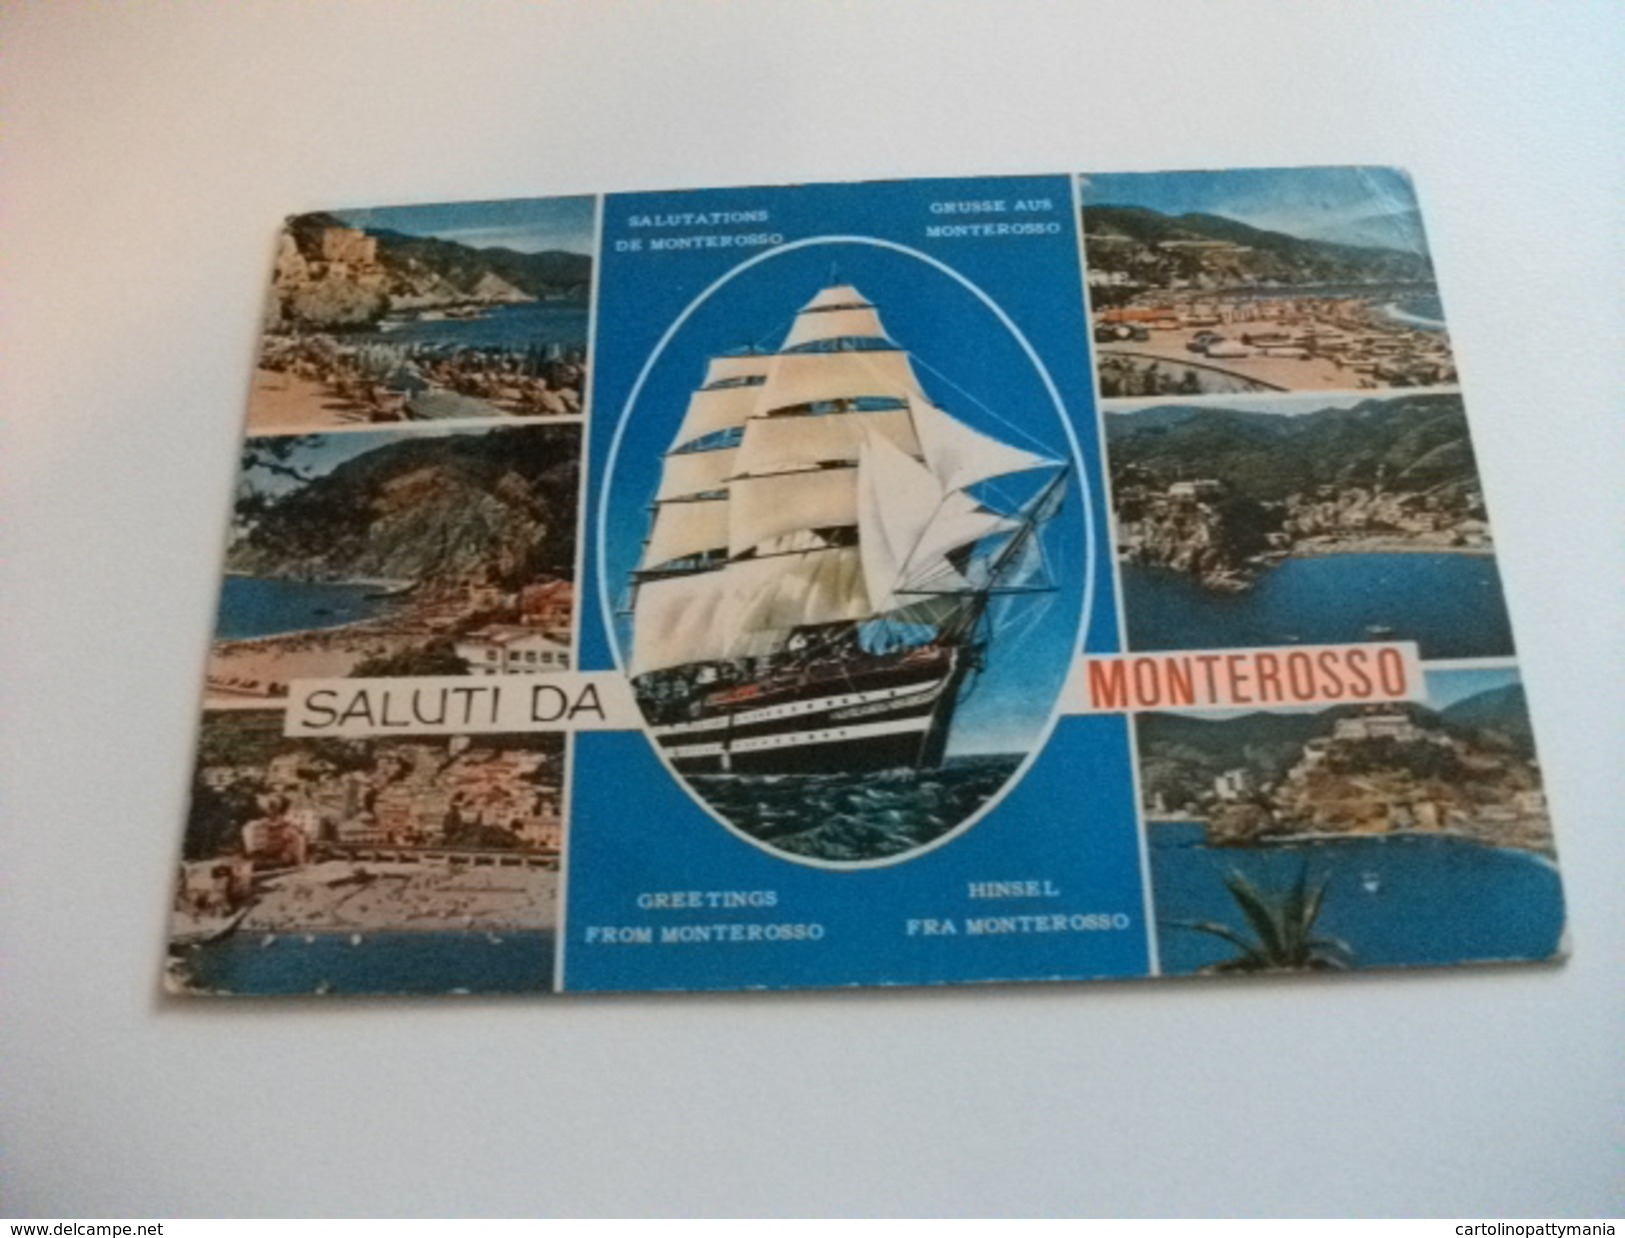 NAVE SHIP VELIERO AMERIGO VESPUCCI SALUTI DA MONTEROSSO VEDUTINE LIGURIA - Velieri